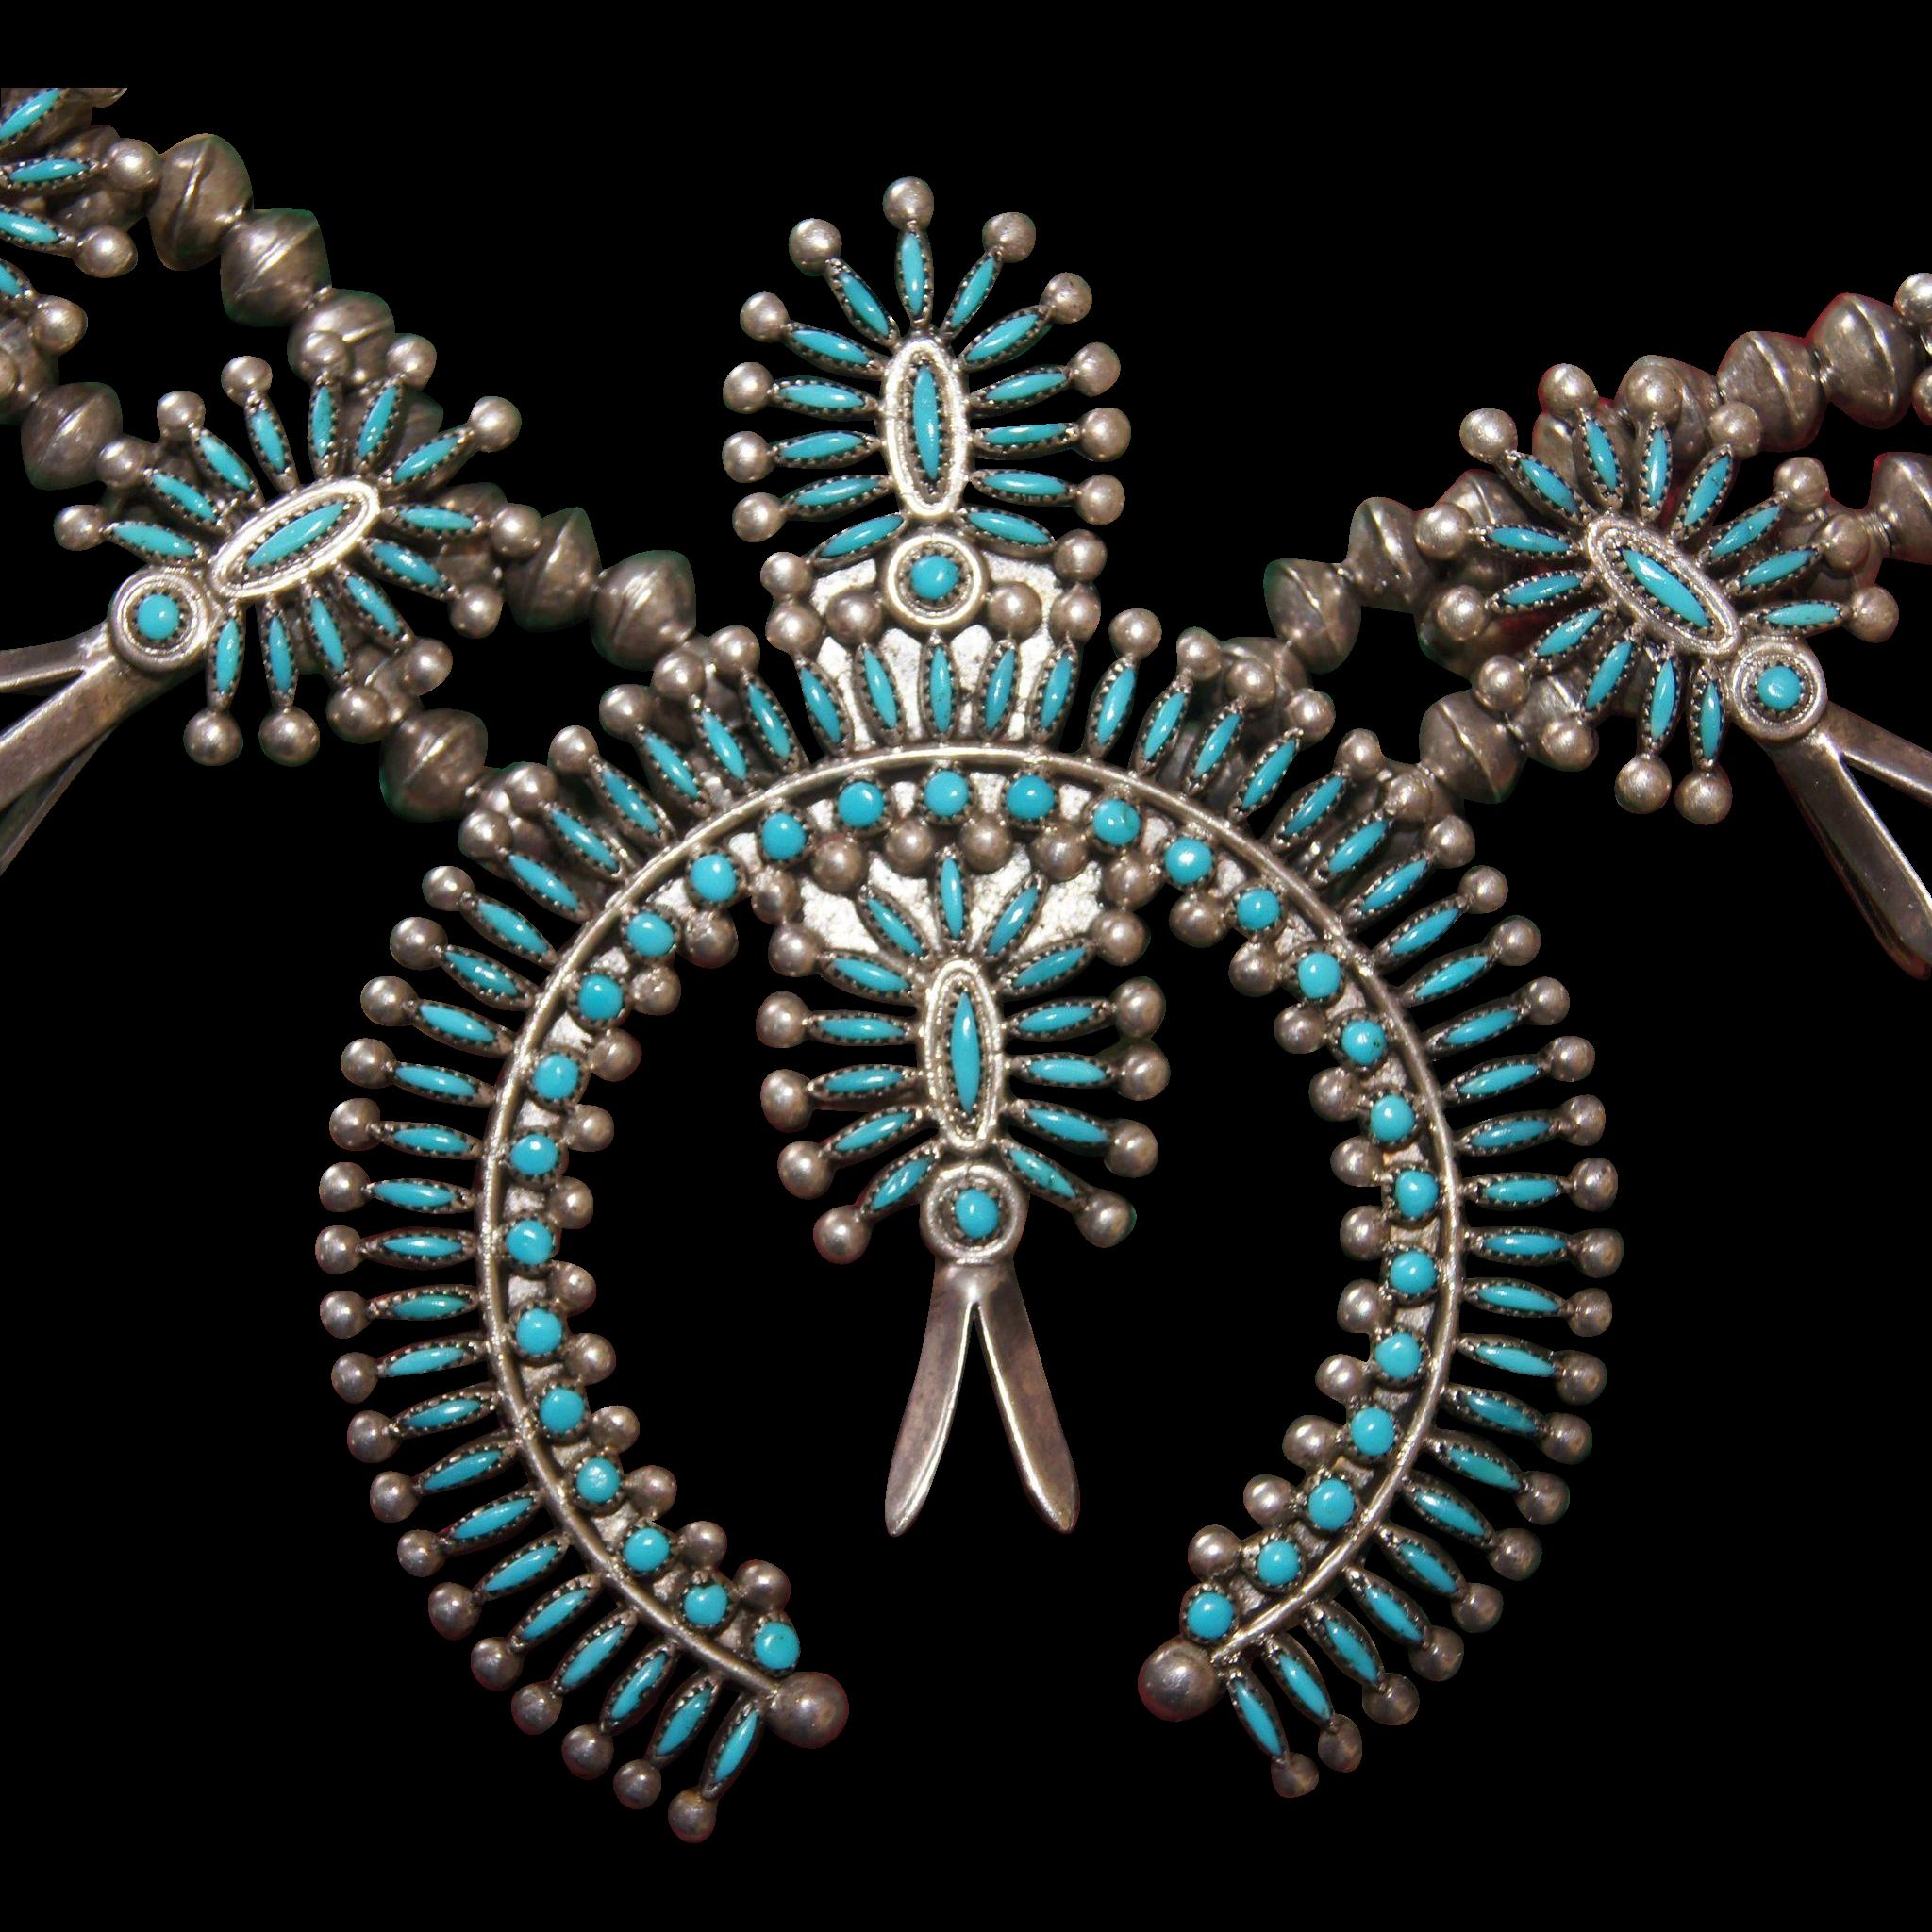 Vintage Zuni Needle Point Squash Blossom Necklace found at www.rubylane.com @rubylanecom